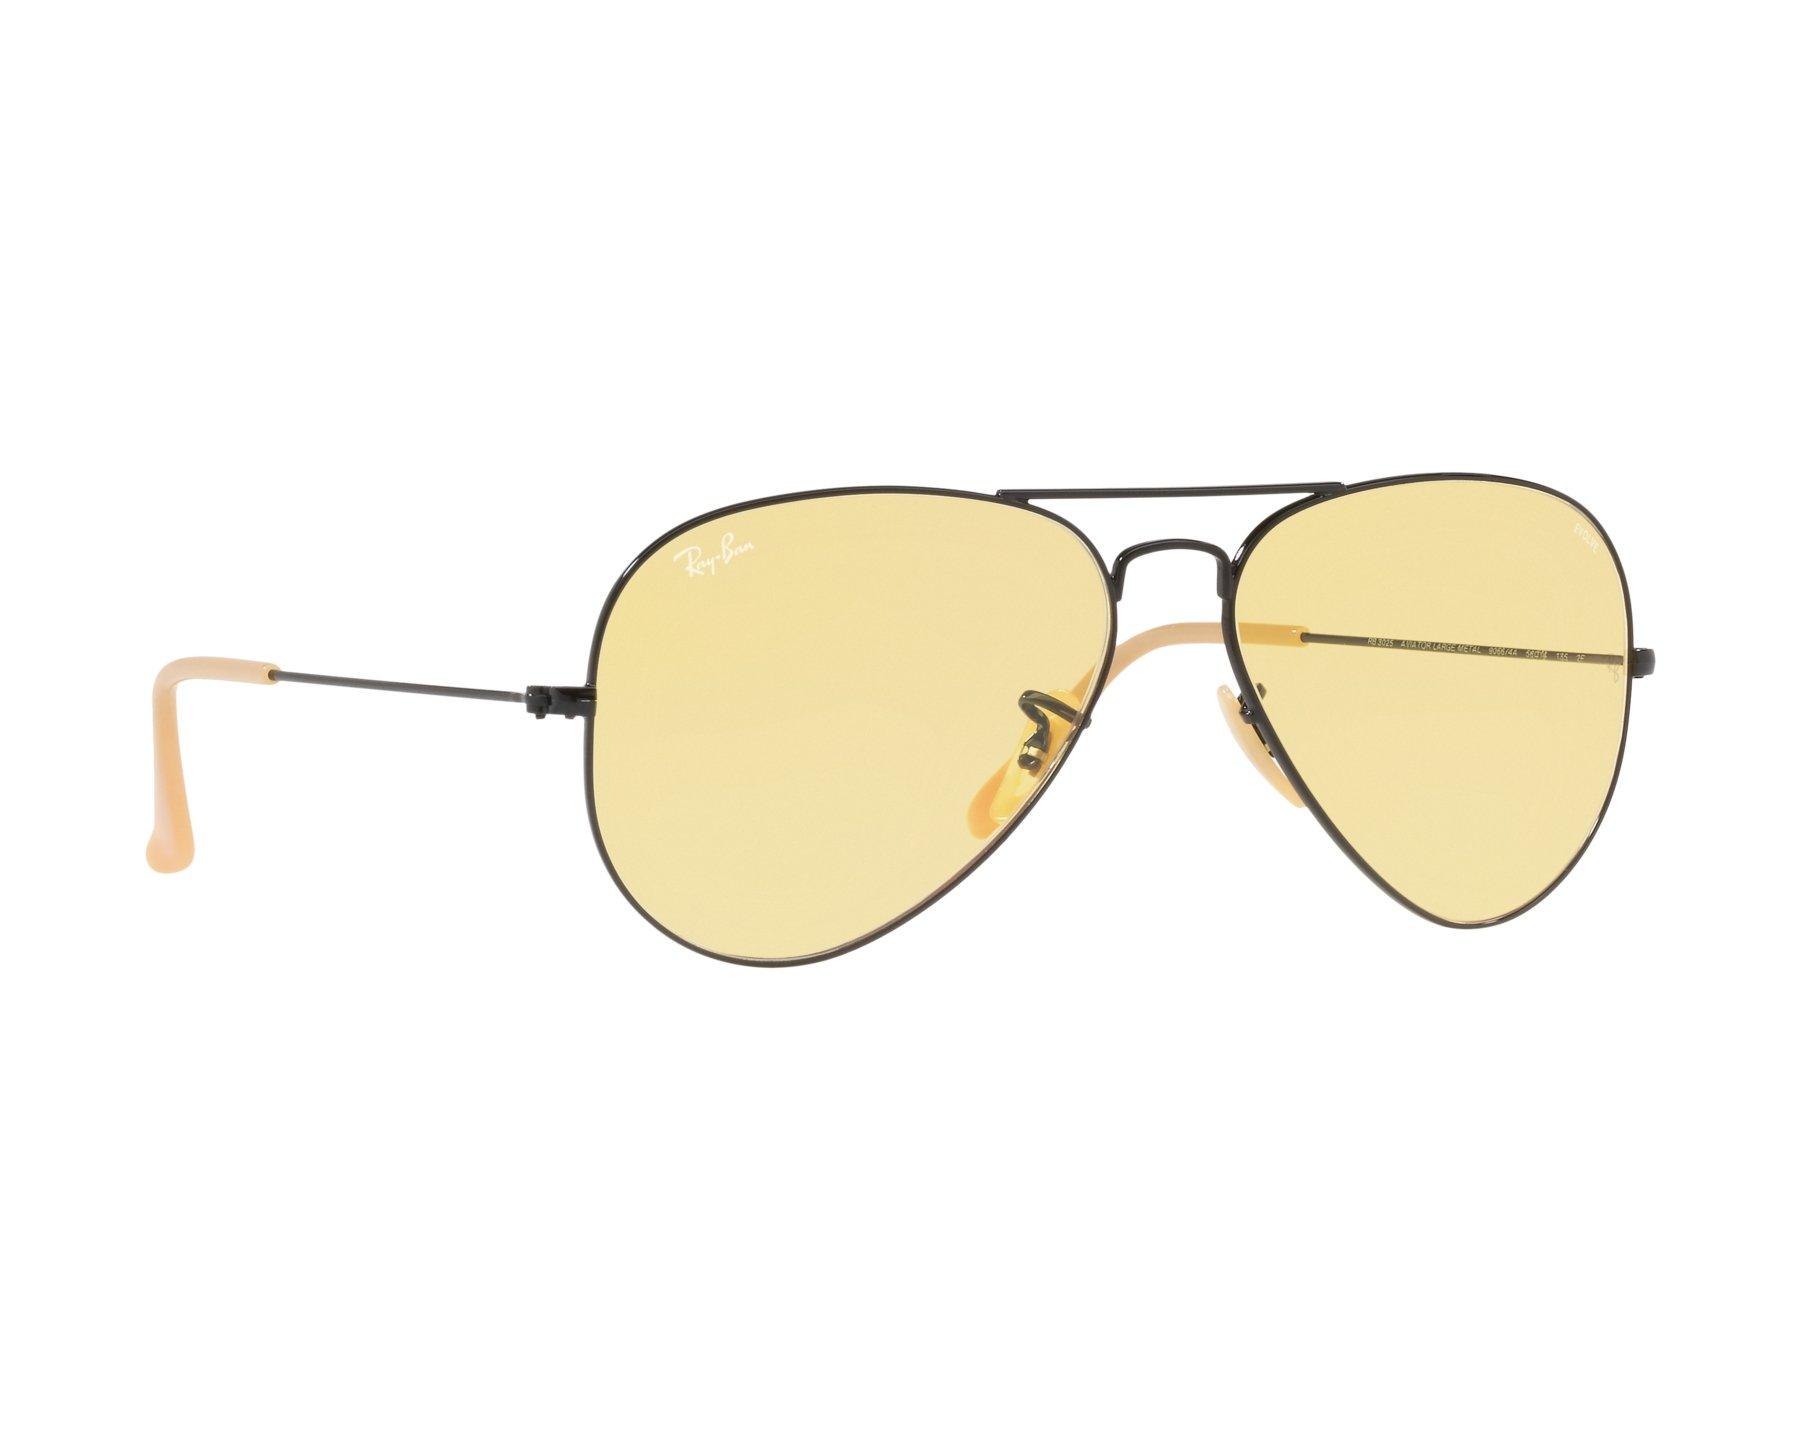 Ray Ban Ray-Ban Sonnenbrille »aviator Large Metal Rb3025«, Schwarz, 90664a - Schwarz/gelb